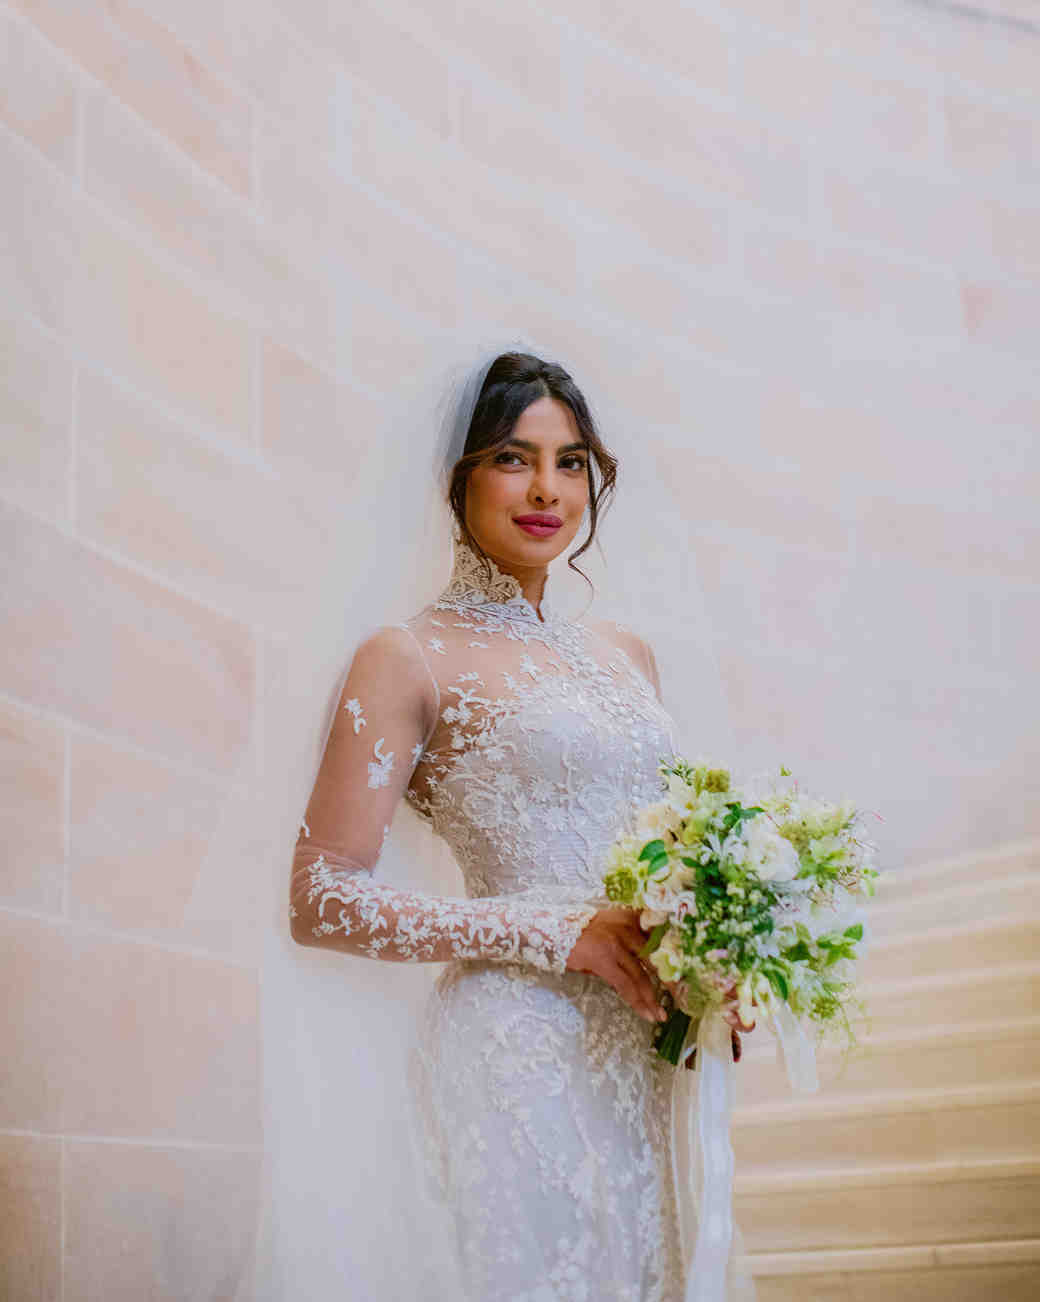 priyanka chopra and nick jonas wedding bouquet